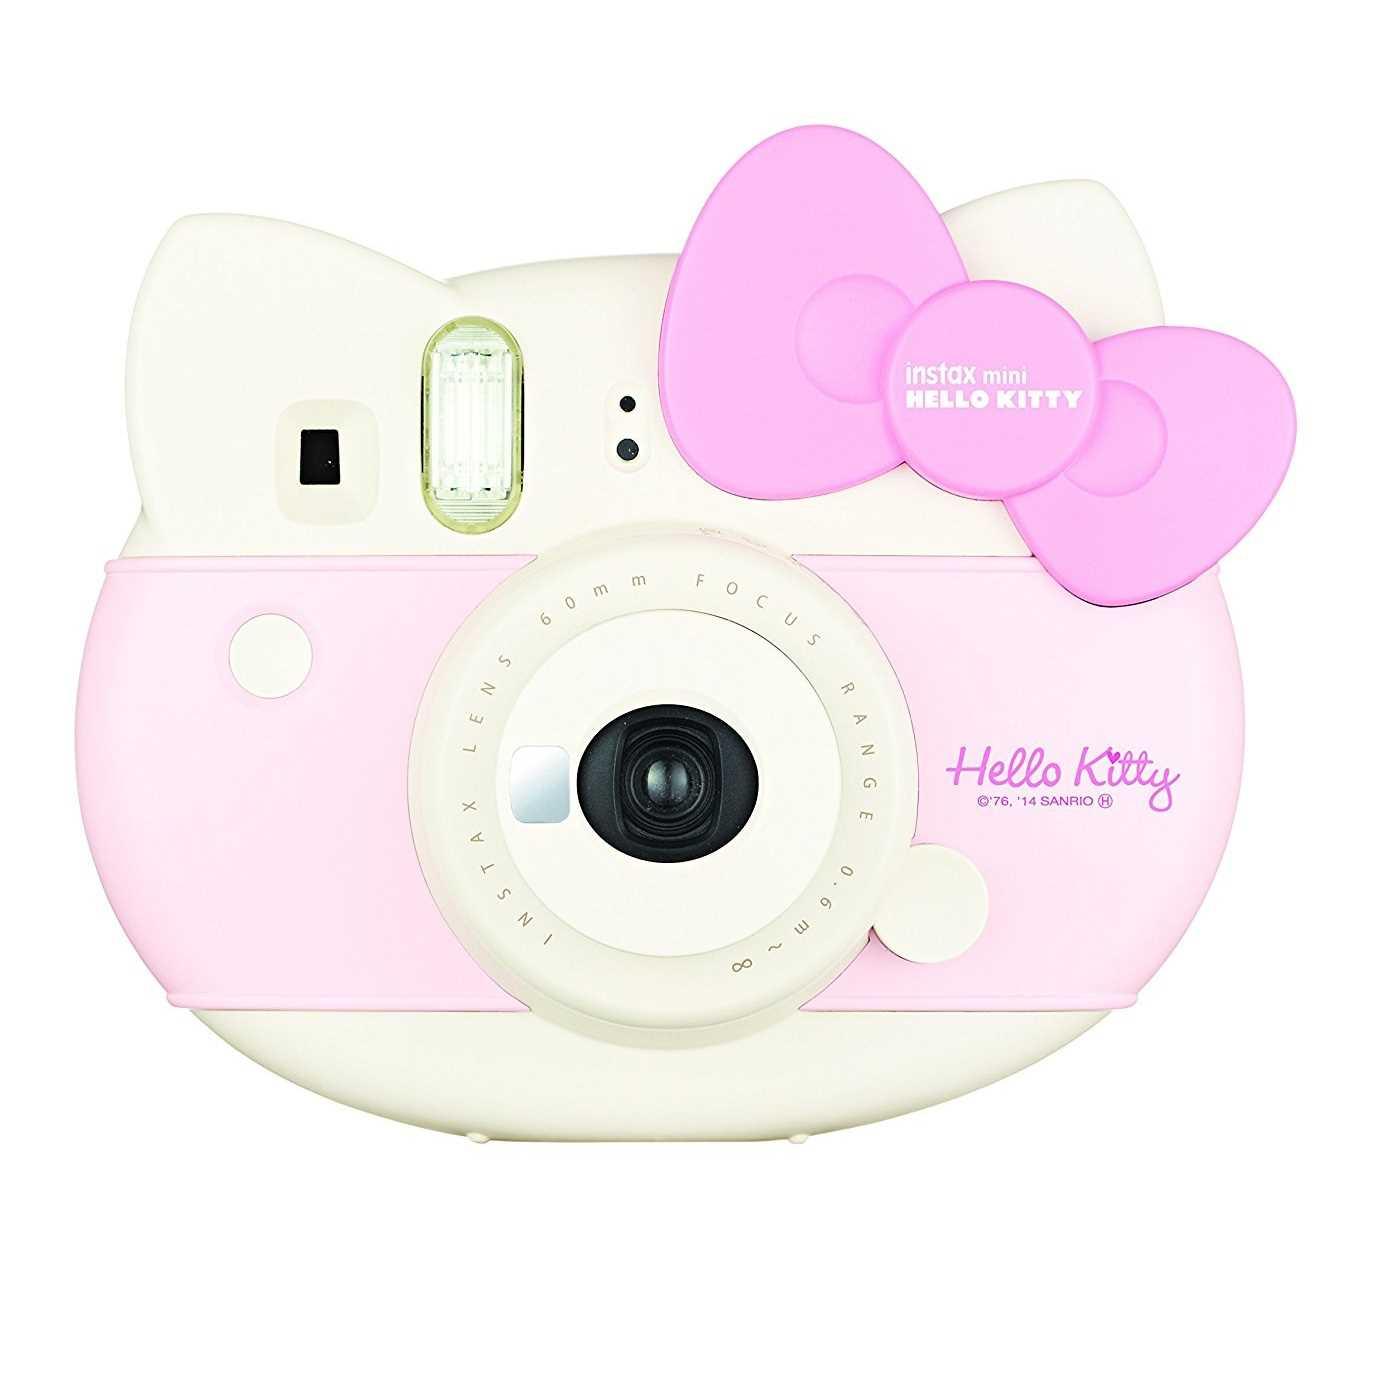 Fujifilm Hello Kitty Mini Instant Camera